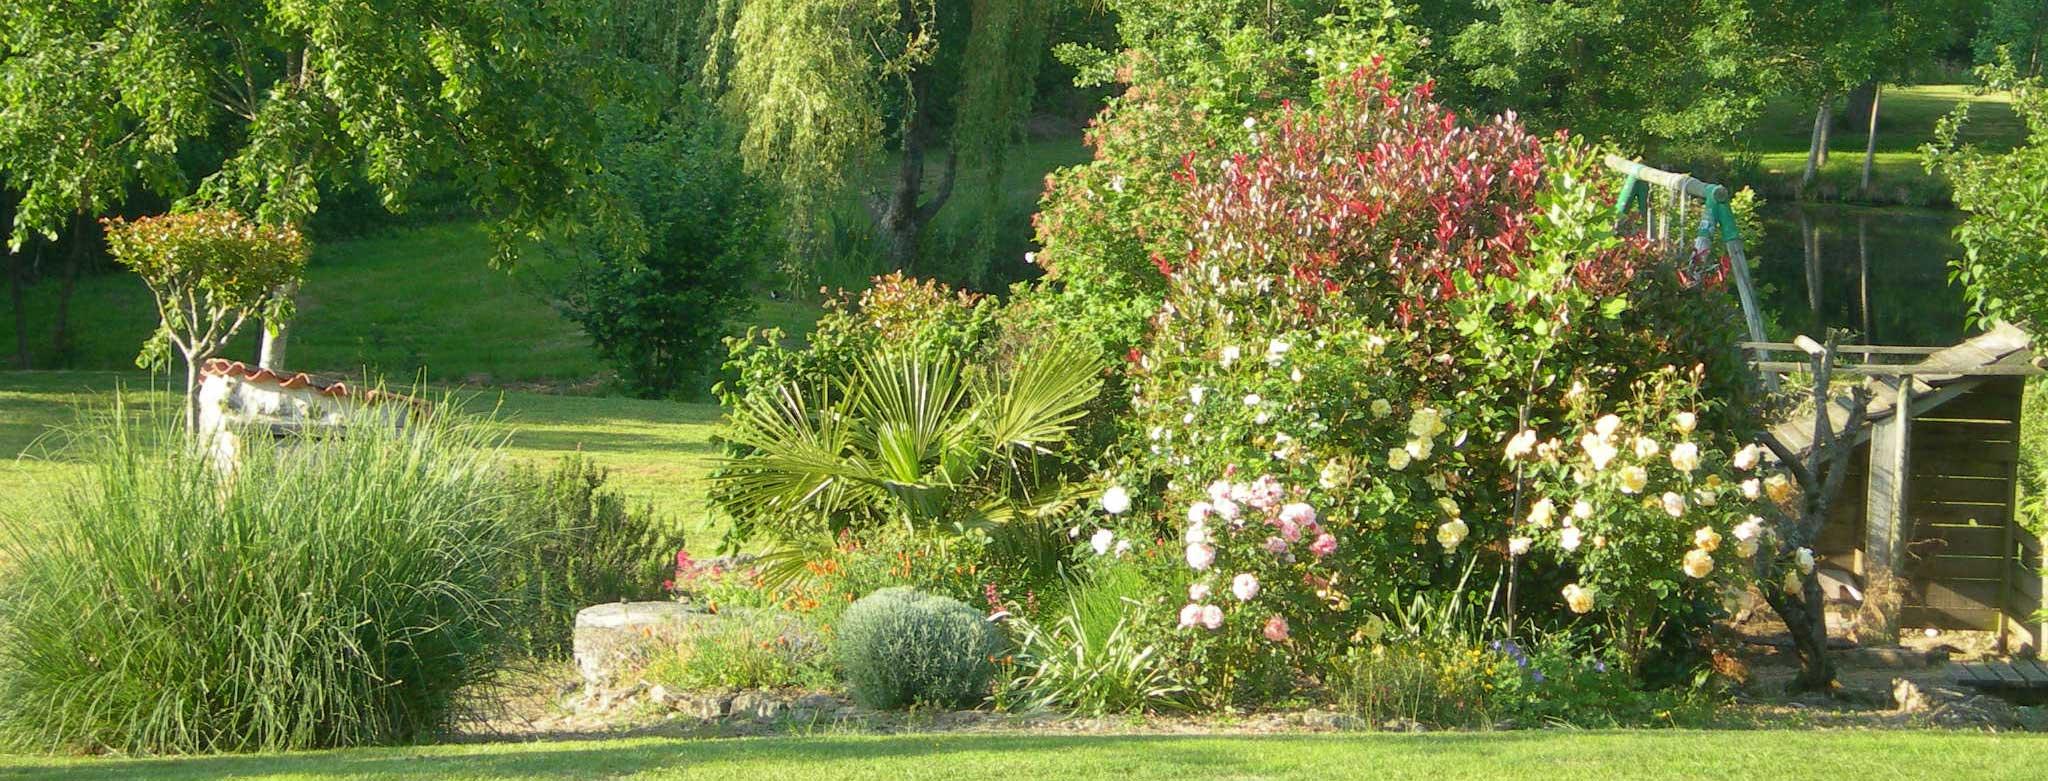 Paysagiste jardinier 78 sarl lefevre parcs et jardins for Jardinier paysagiste 71